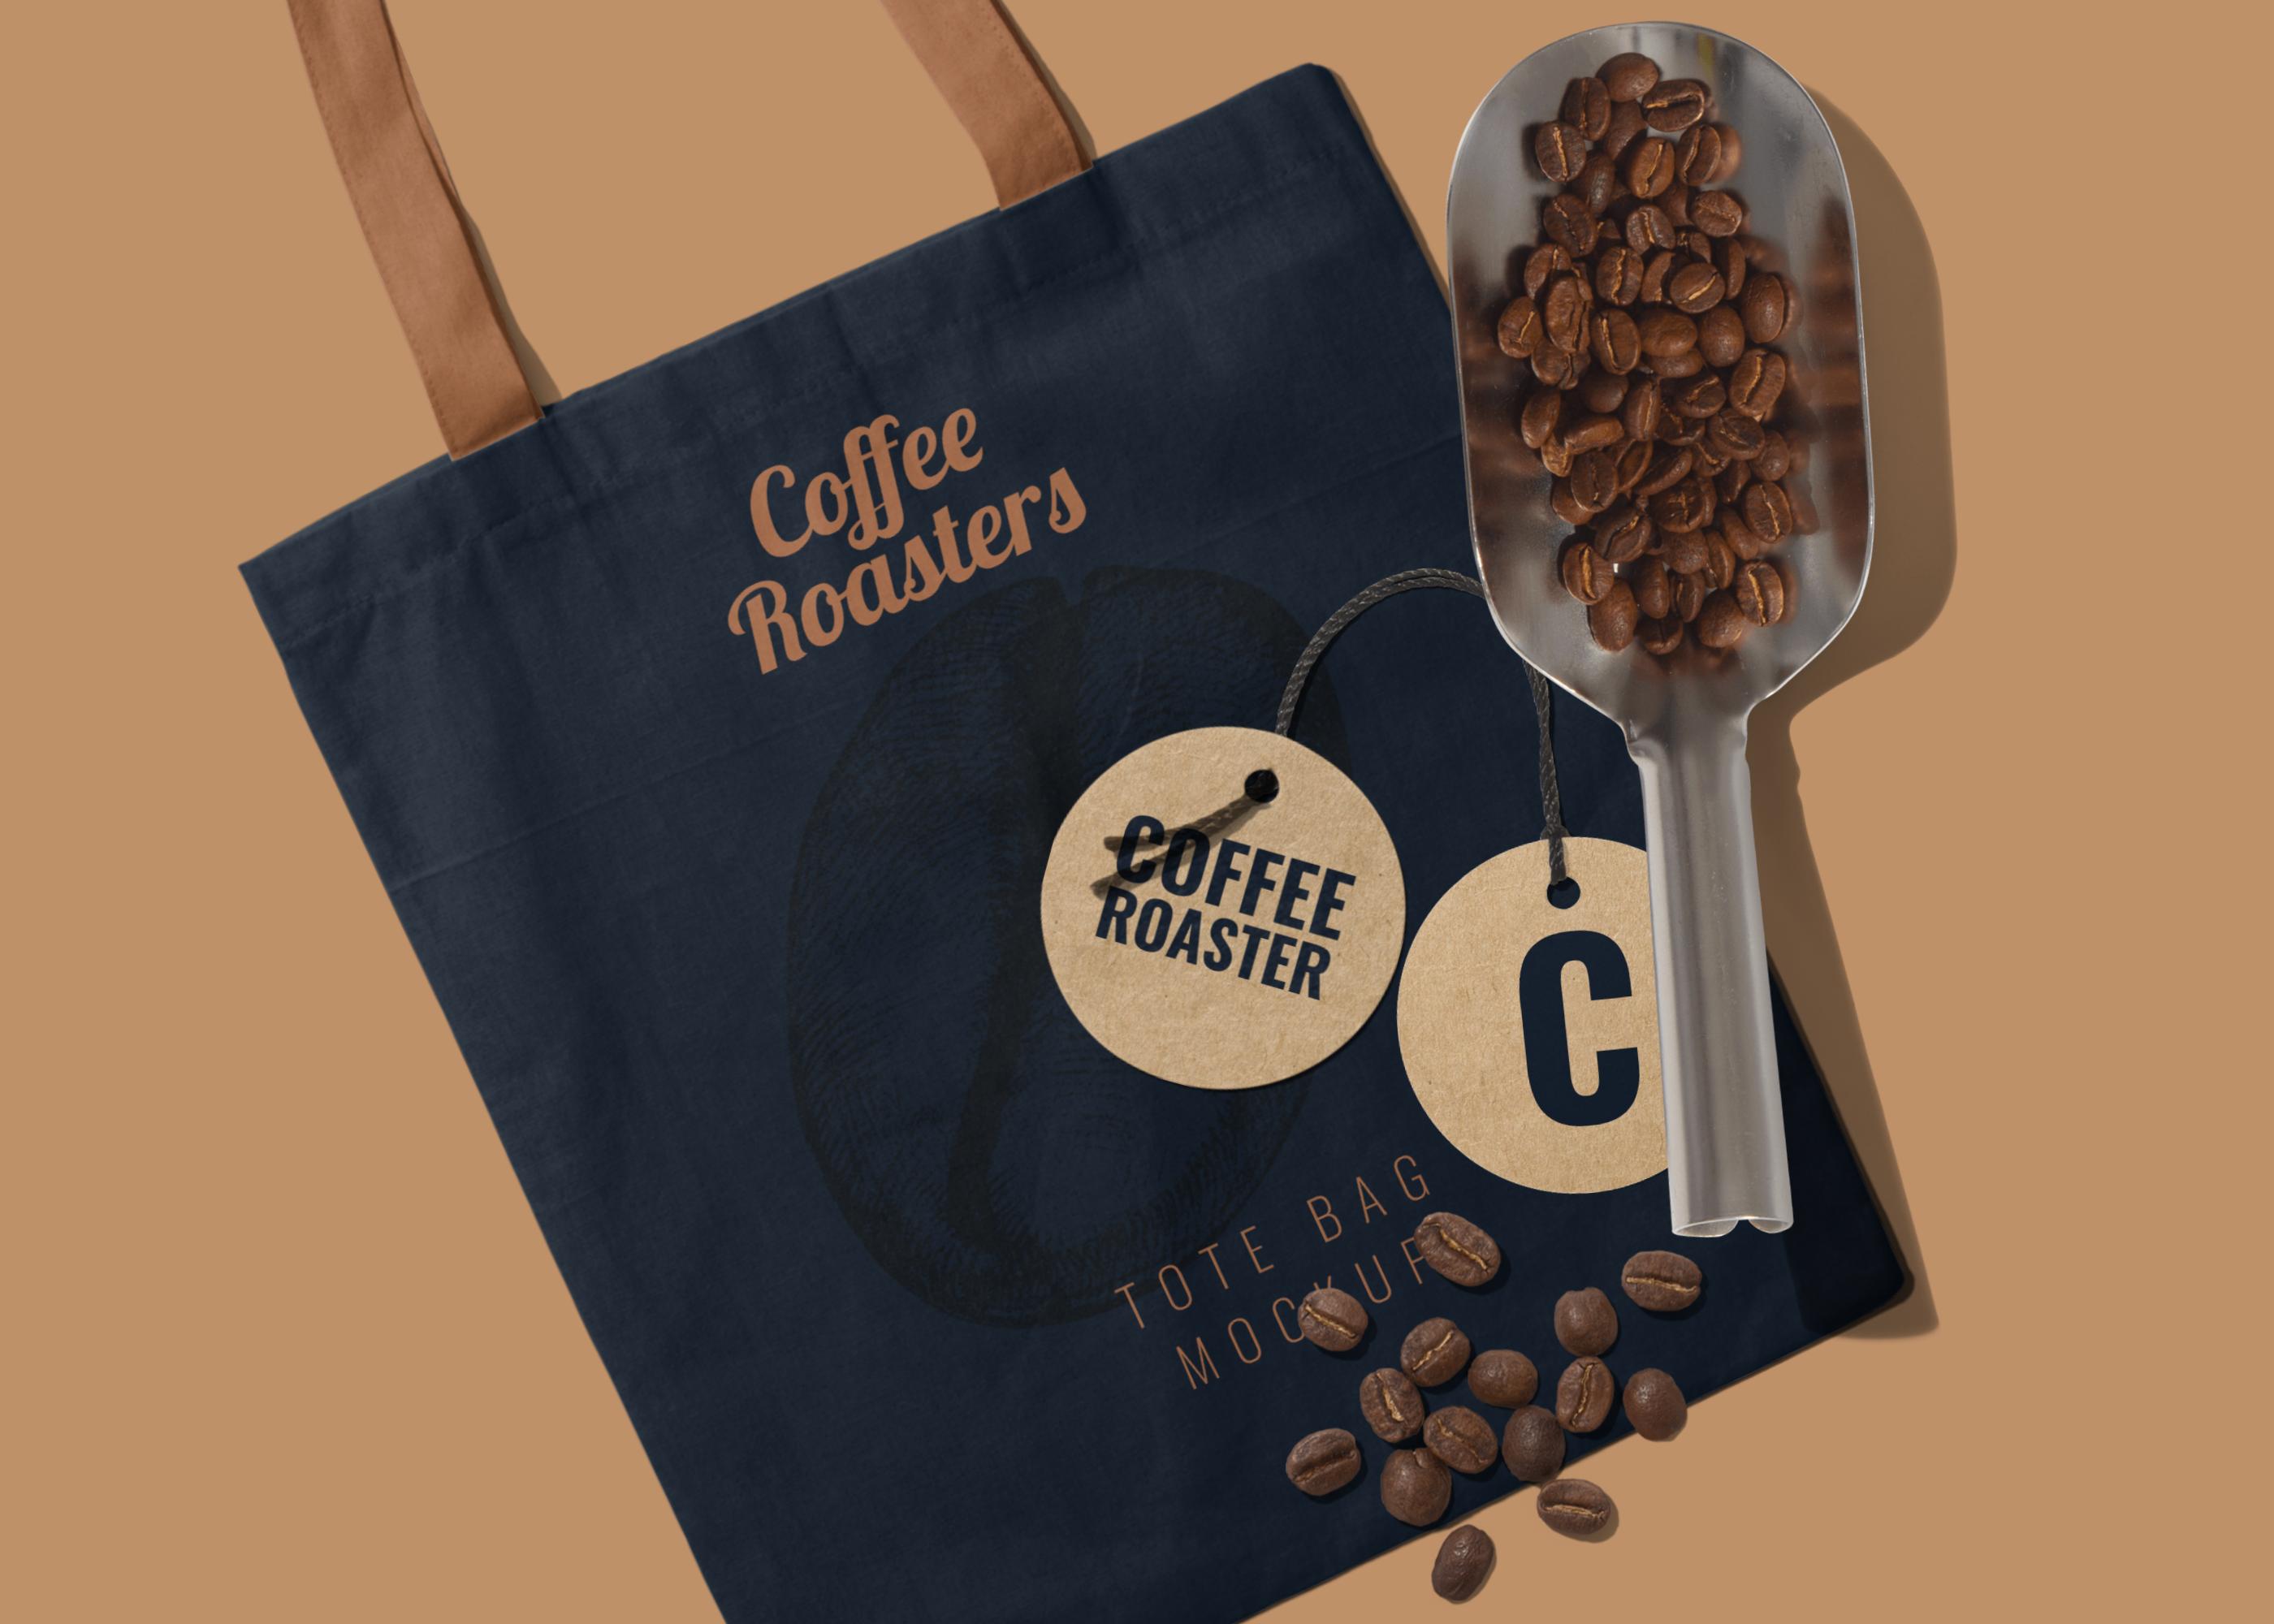 Download Coffee Brand Tote Bag Mockup Scene Bag Mockup Branded Tote Bags Your Design